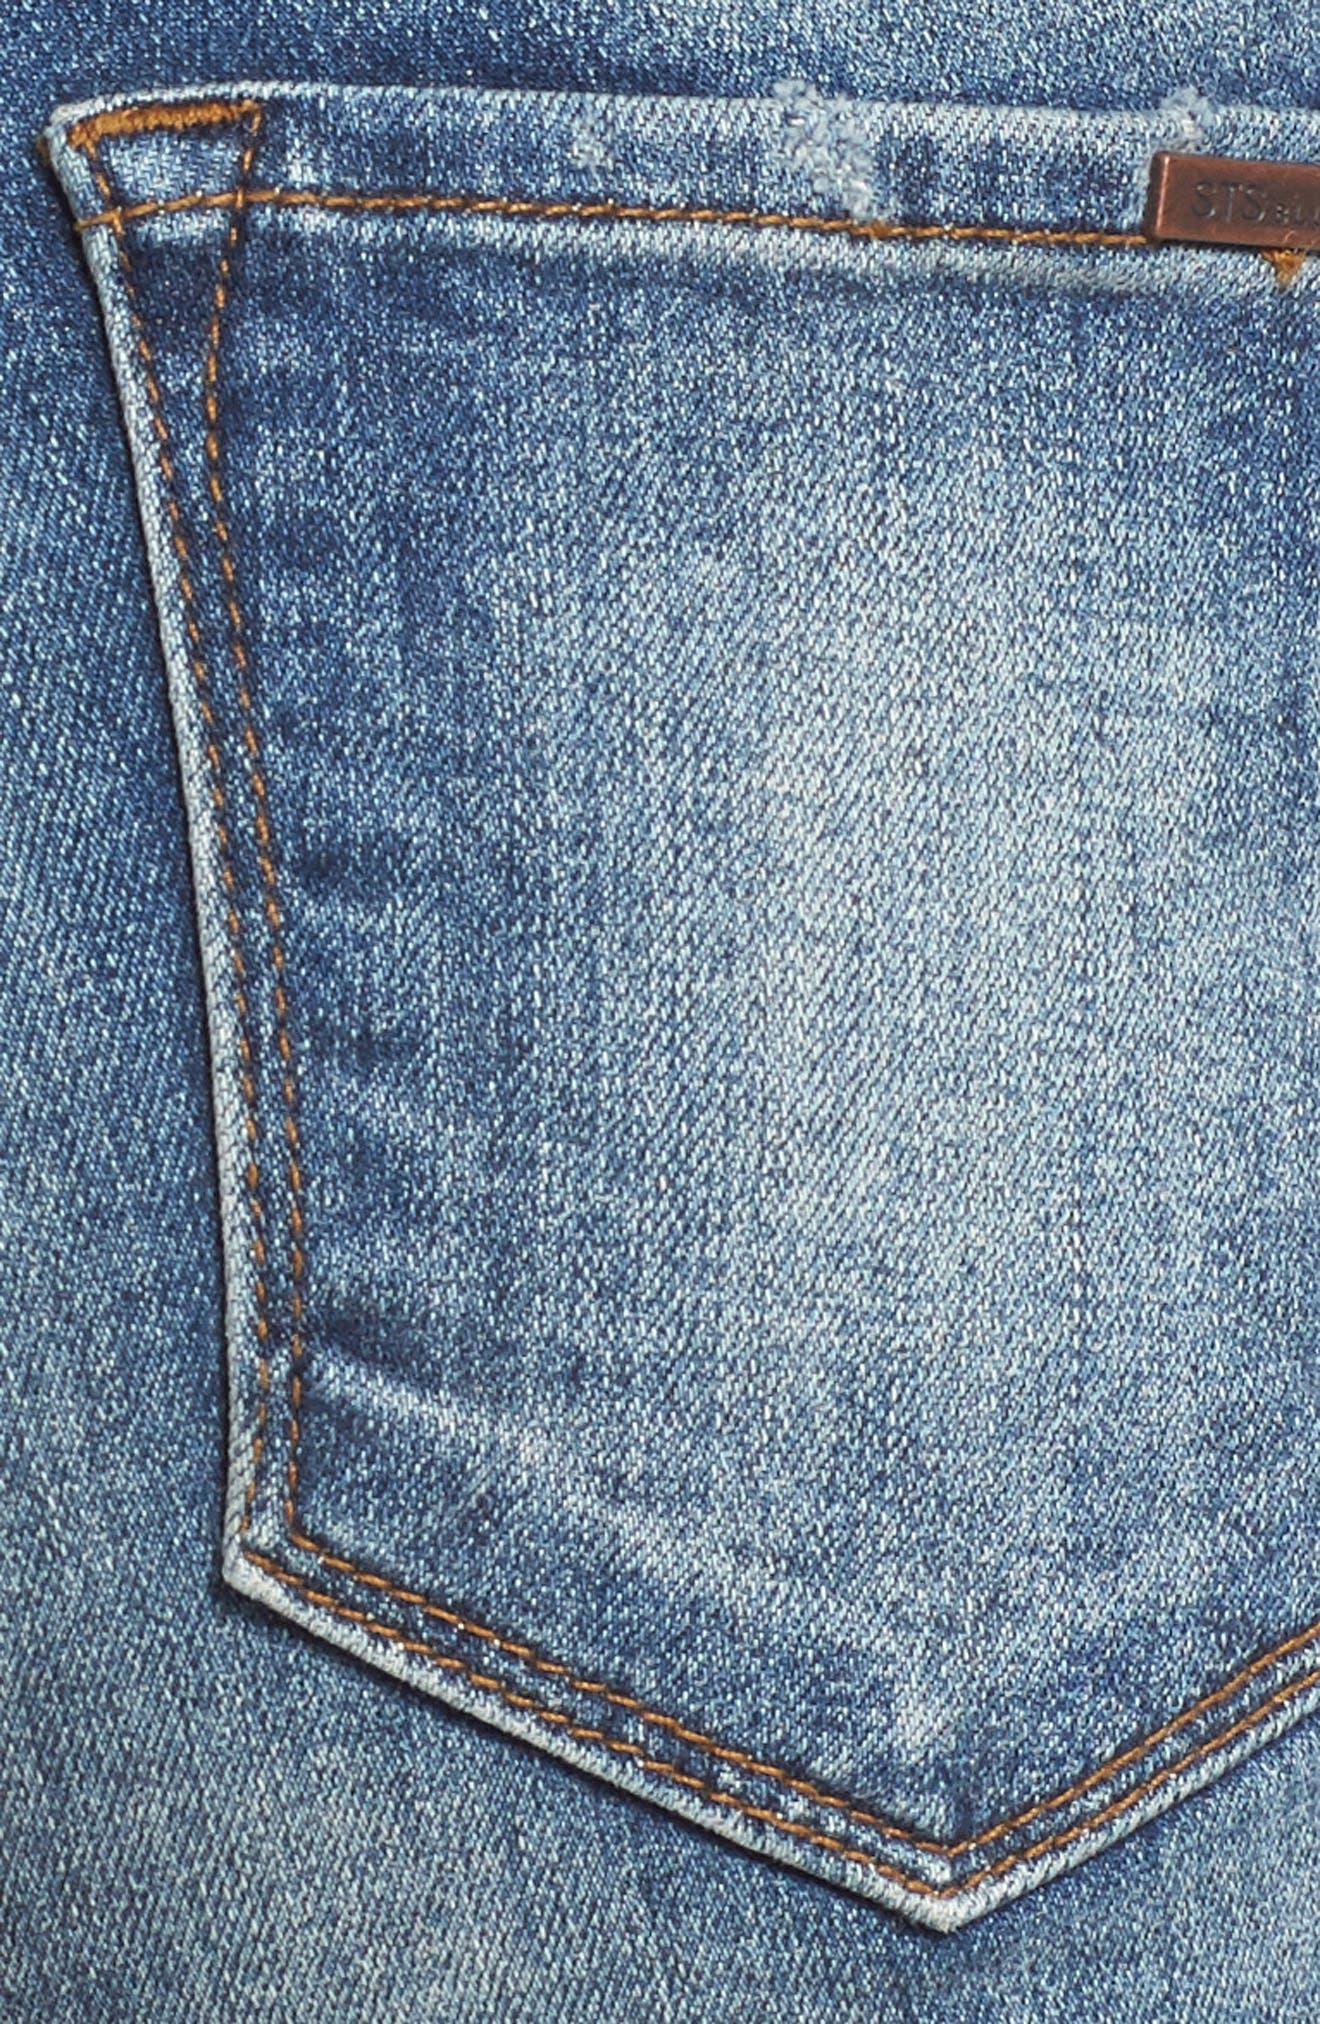 Boyfriend Denim Shorts,                             Alternate thumbnail 6, color,                             400